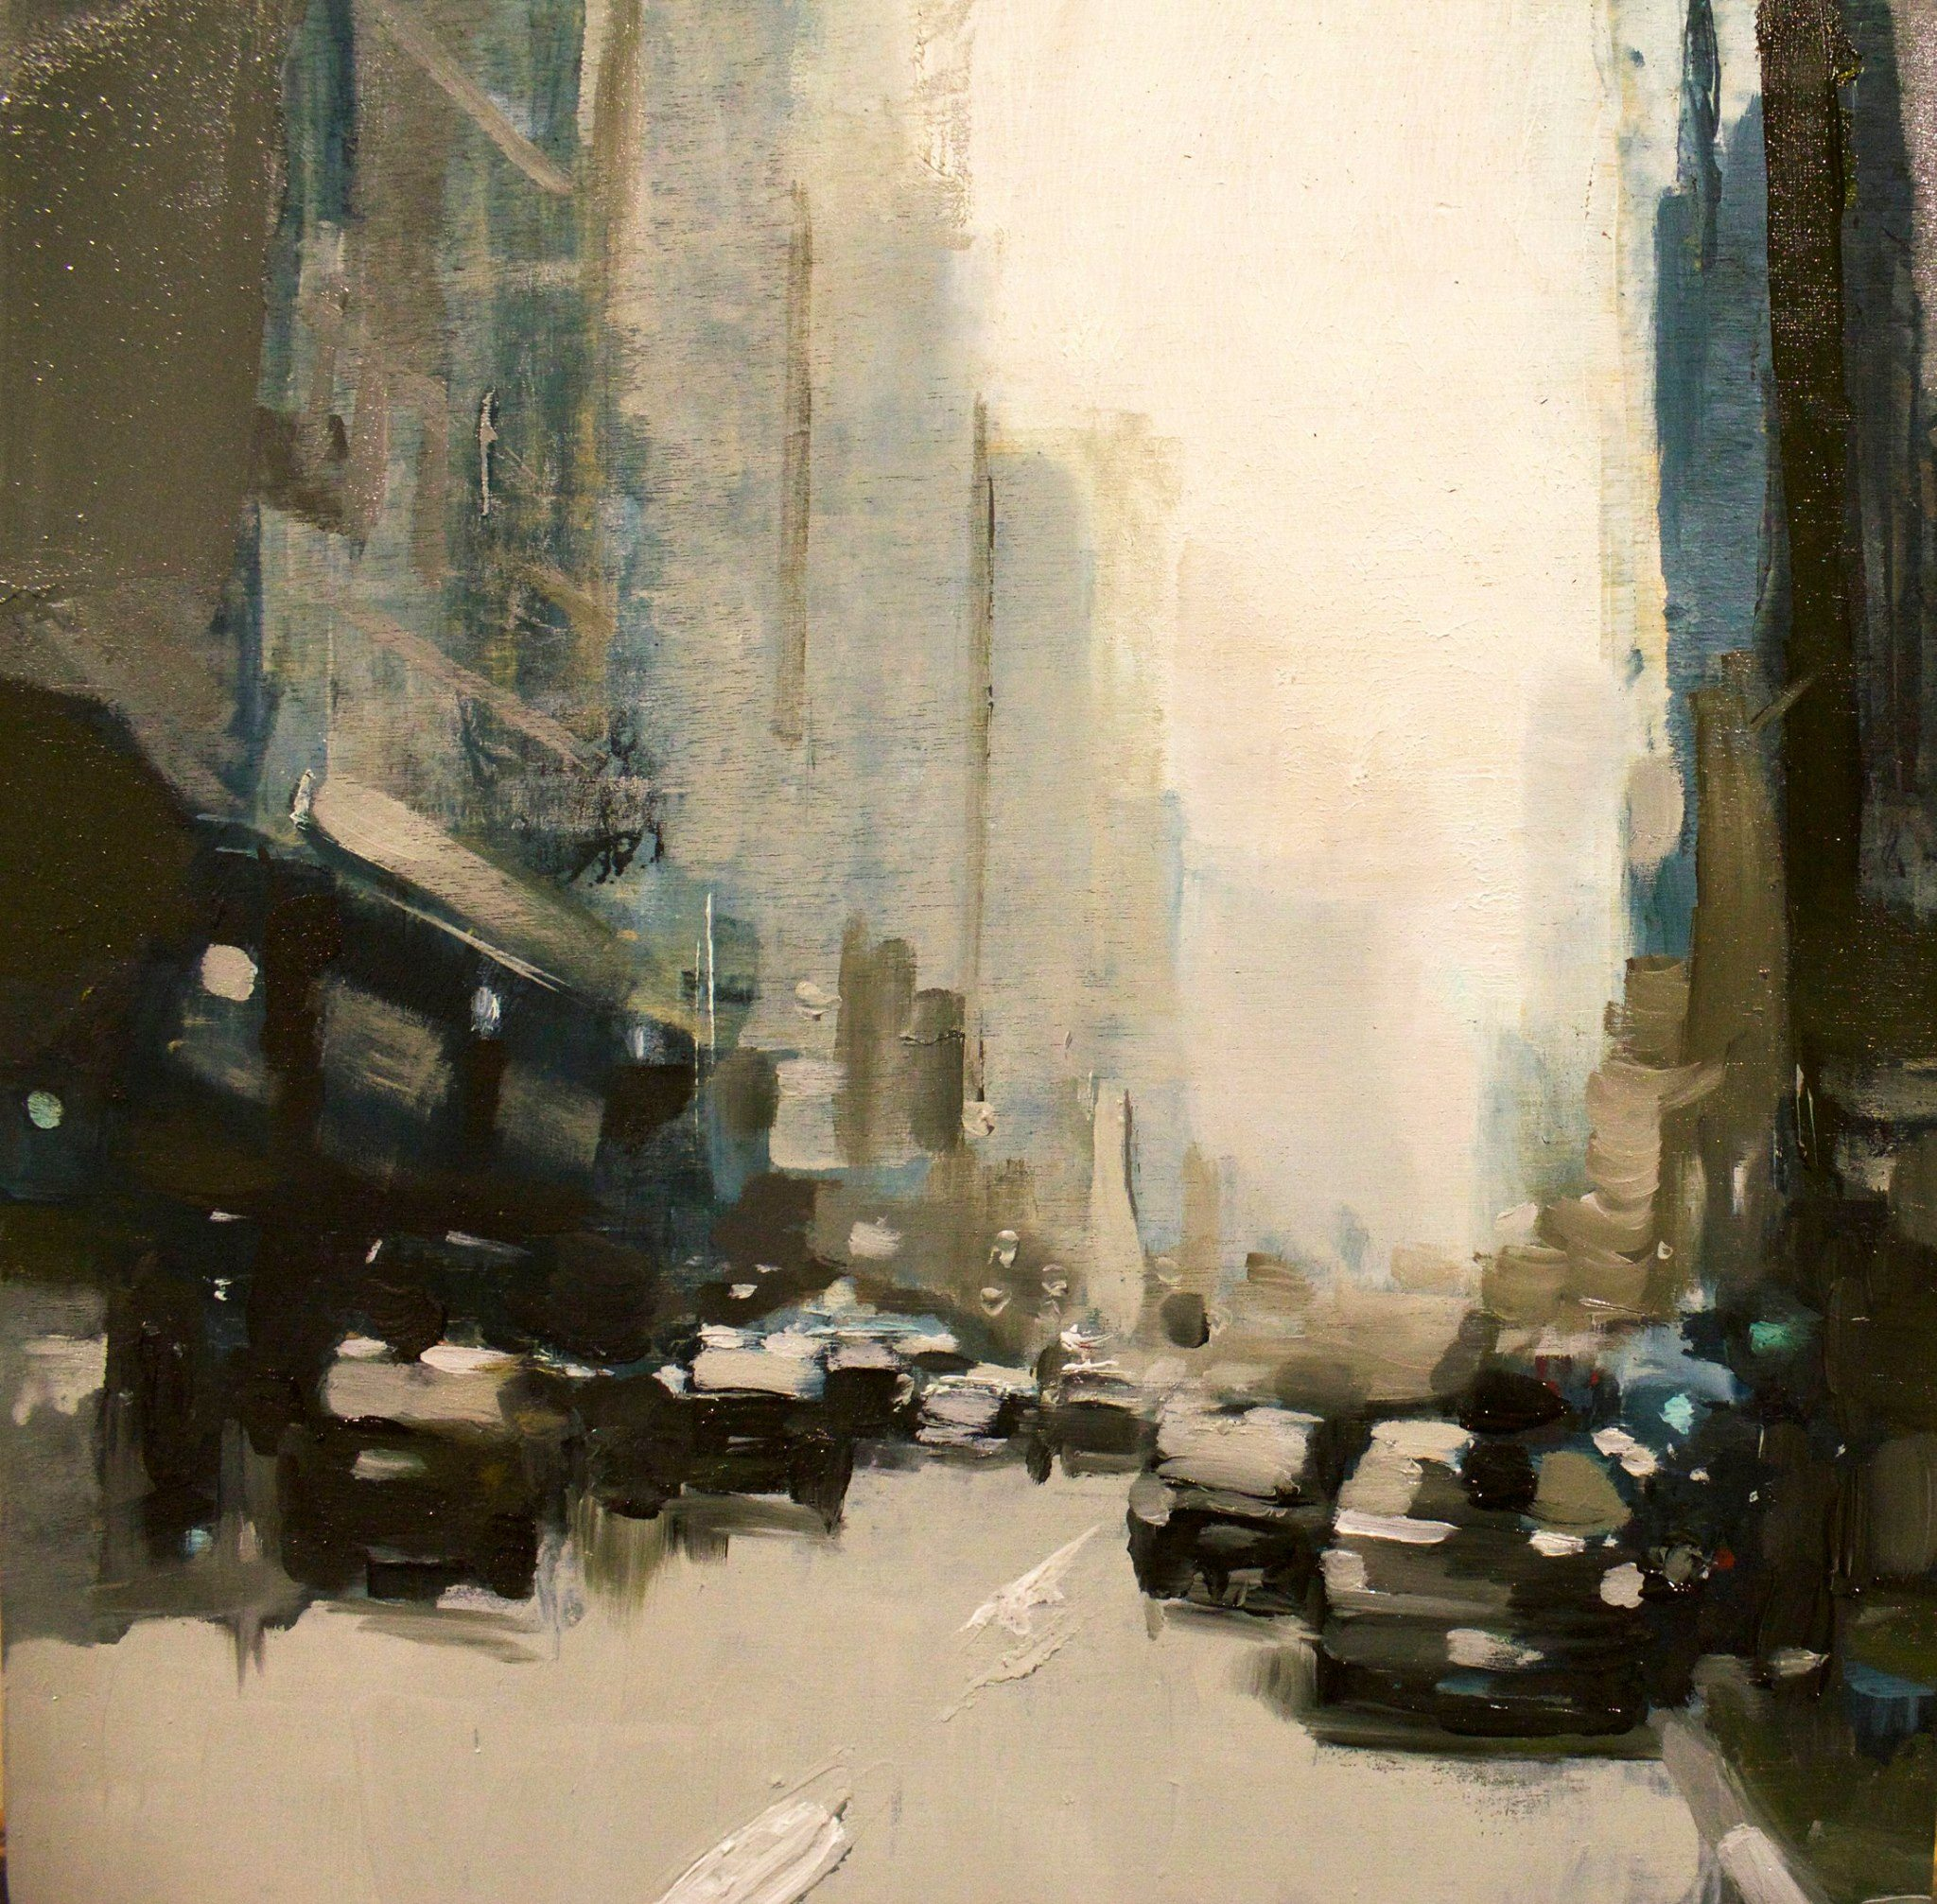 NY city study #24 22 Dec 2016 Oil on panel